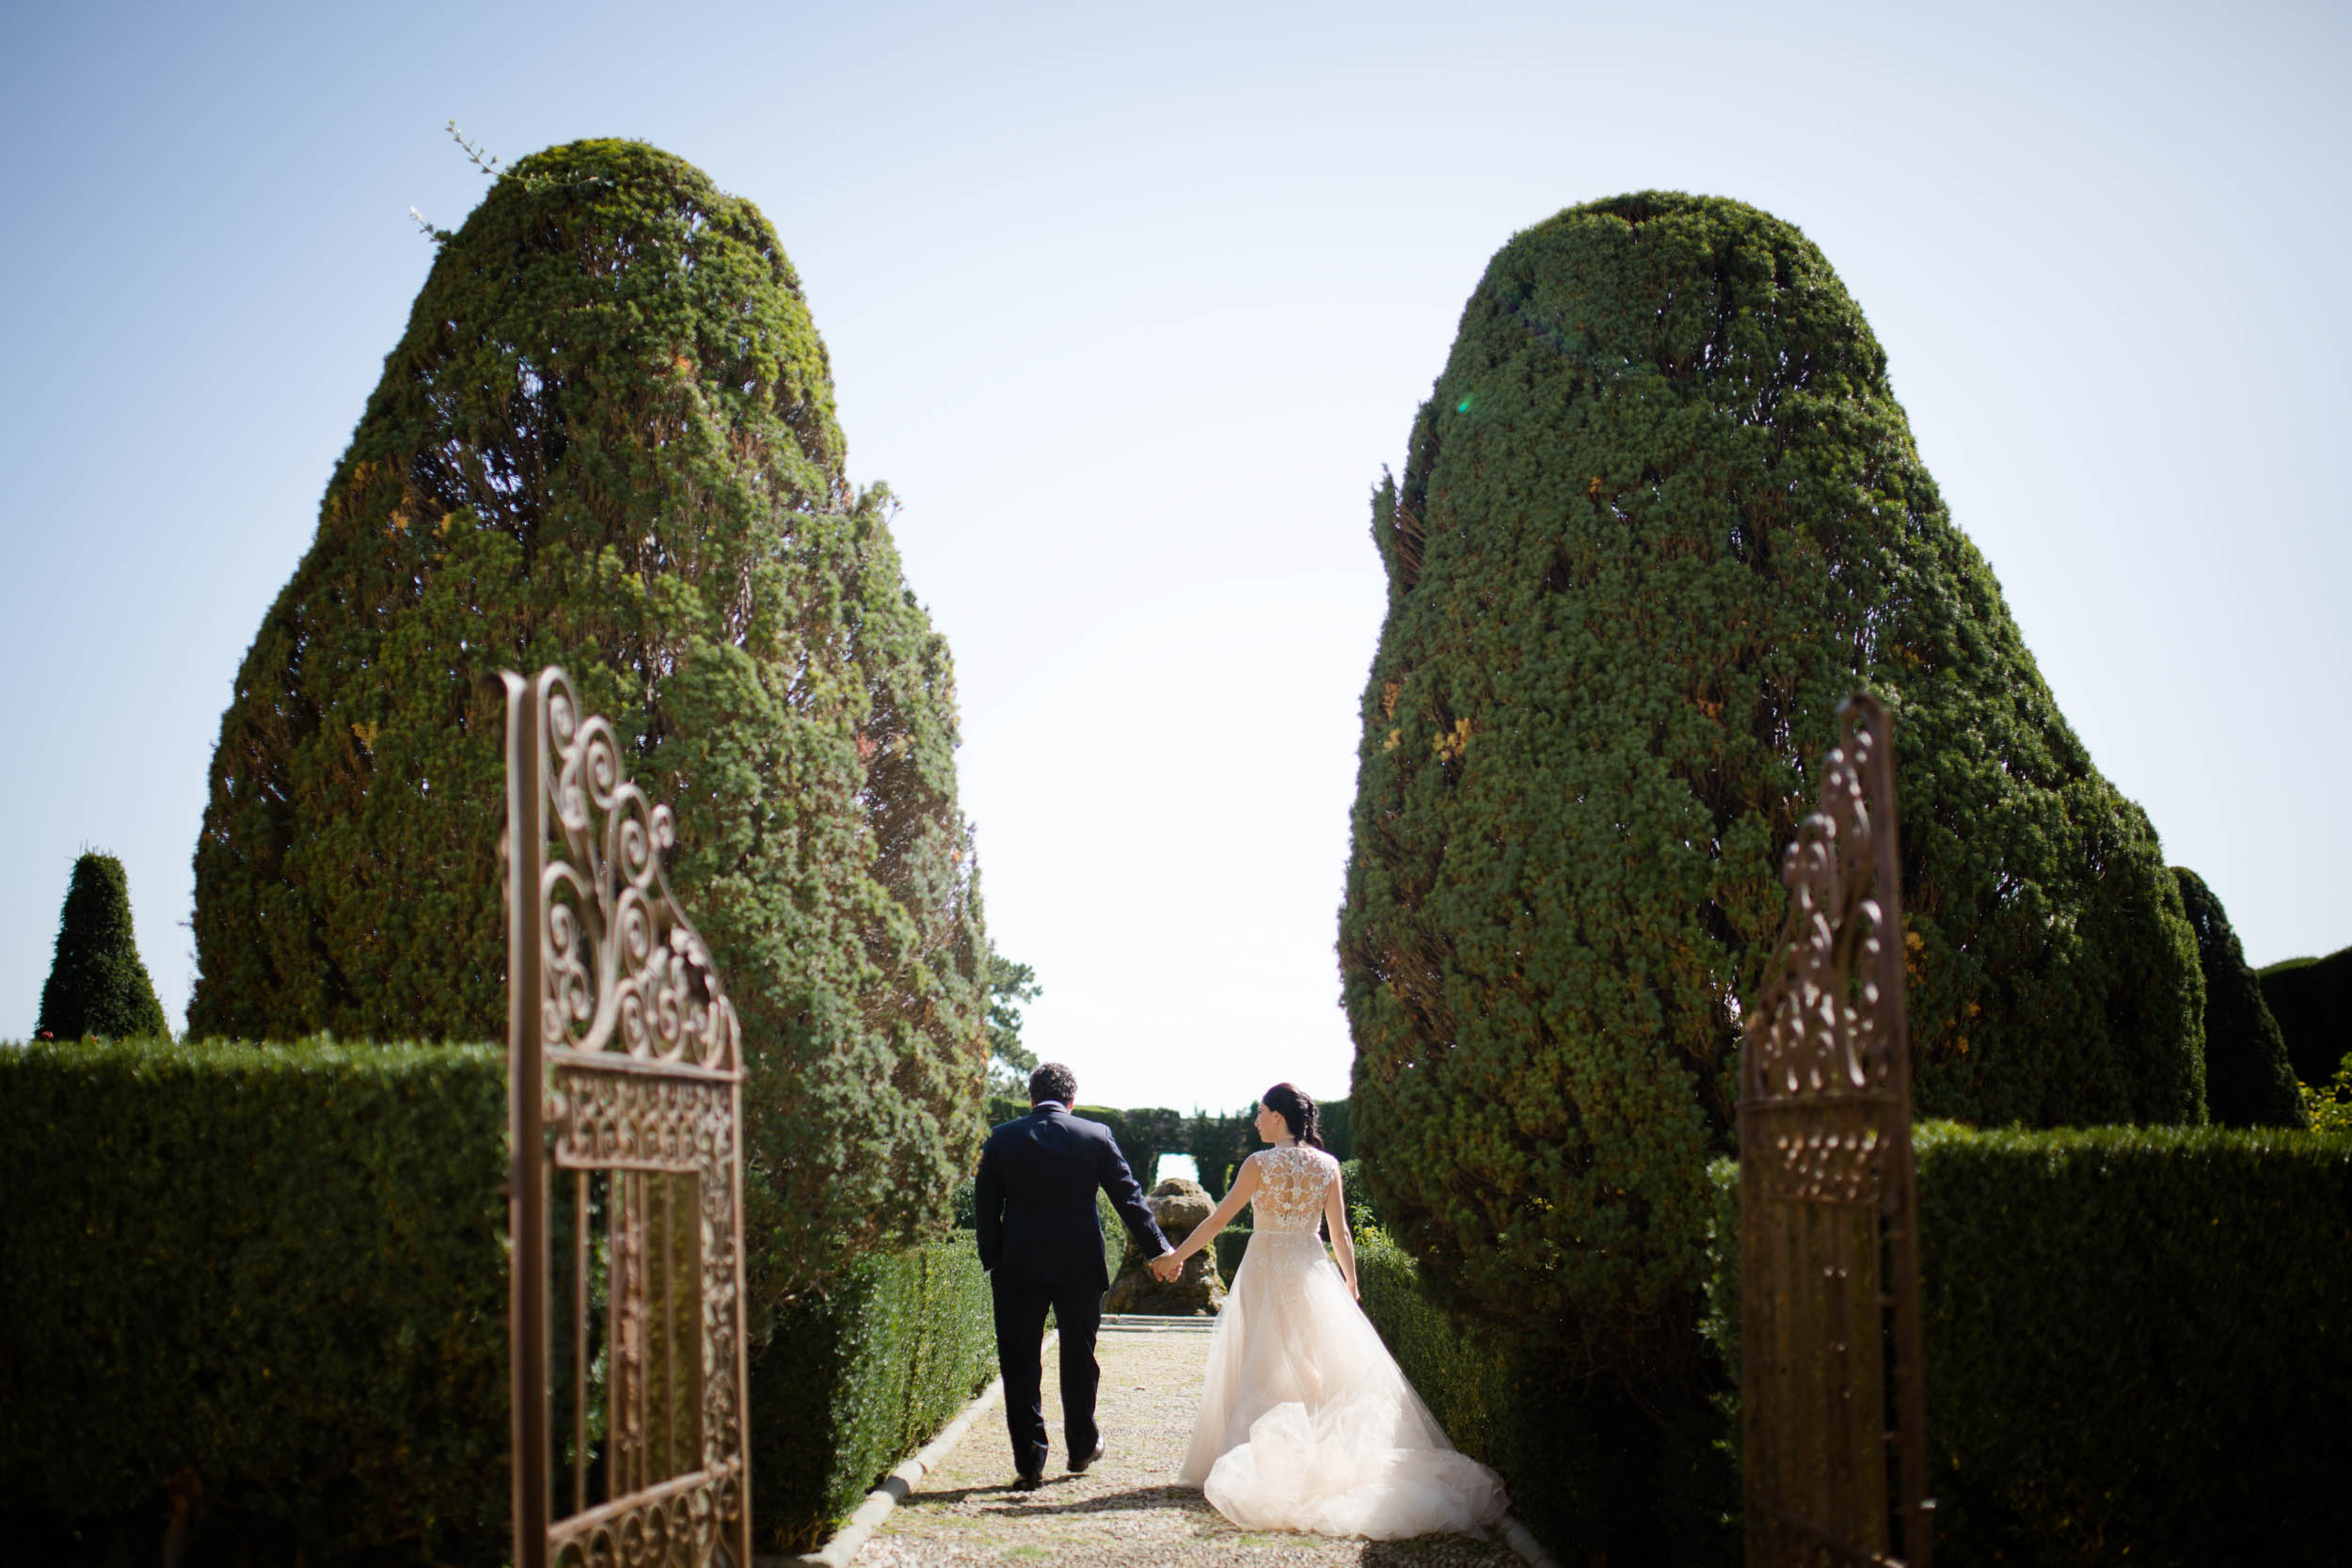 villa-gamberaia-florence-italy-destination-wedding-6.jpg